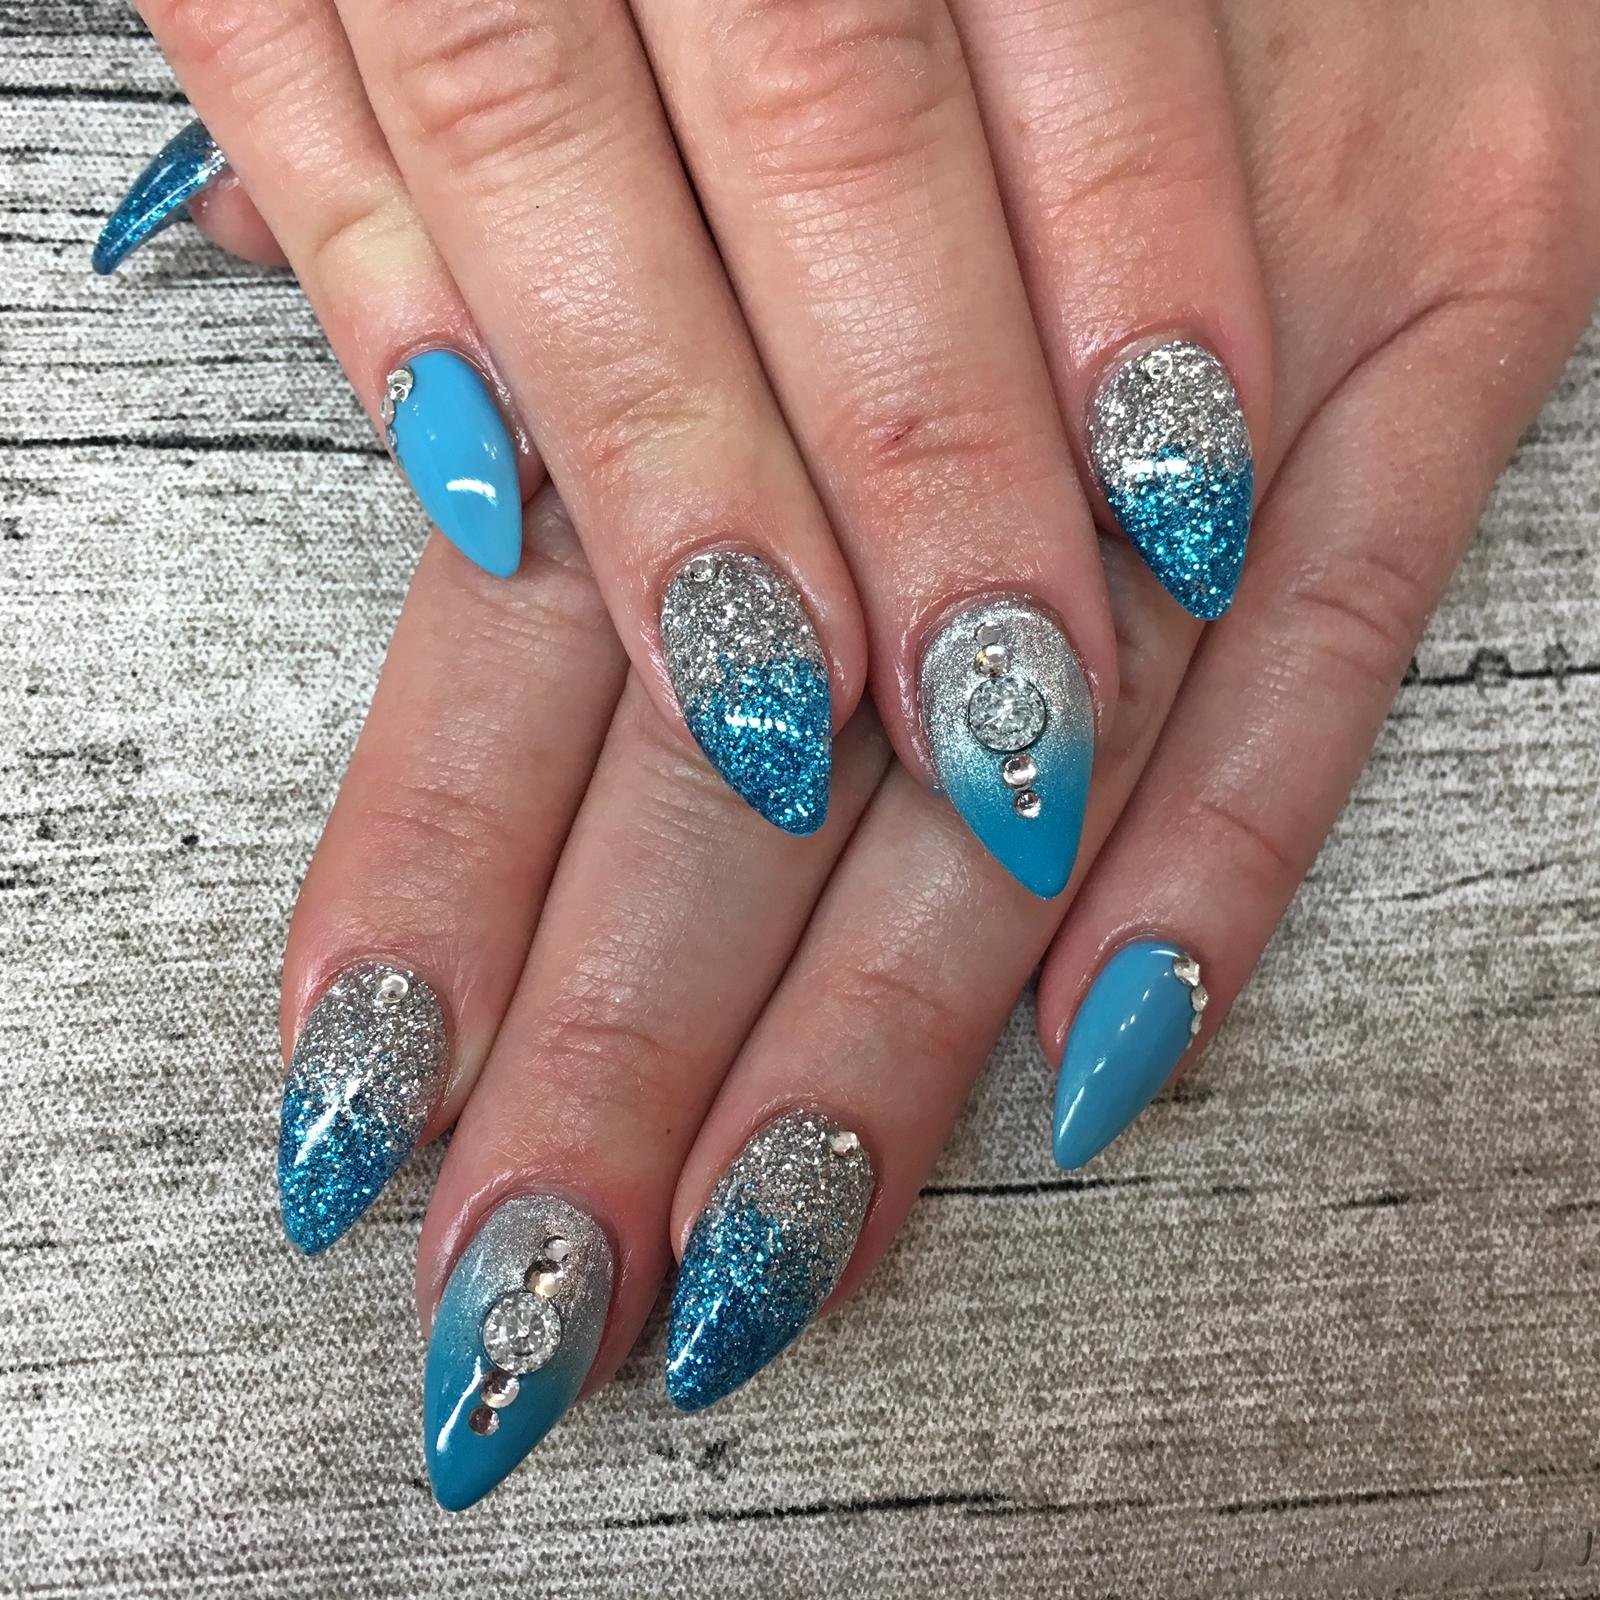 Nail Art Inspiration 2 Fashionladyloves